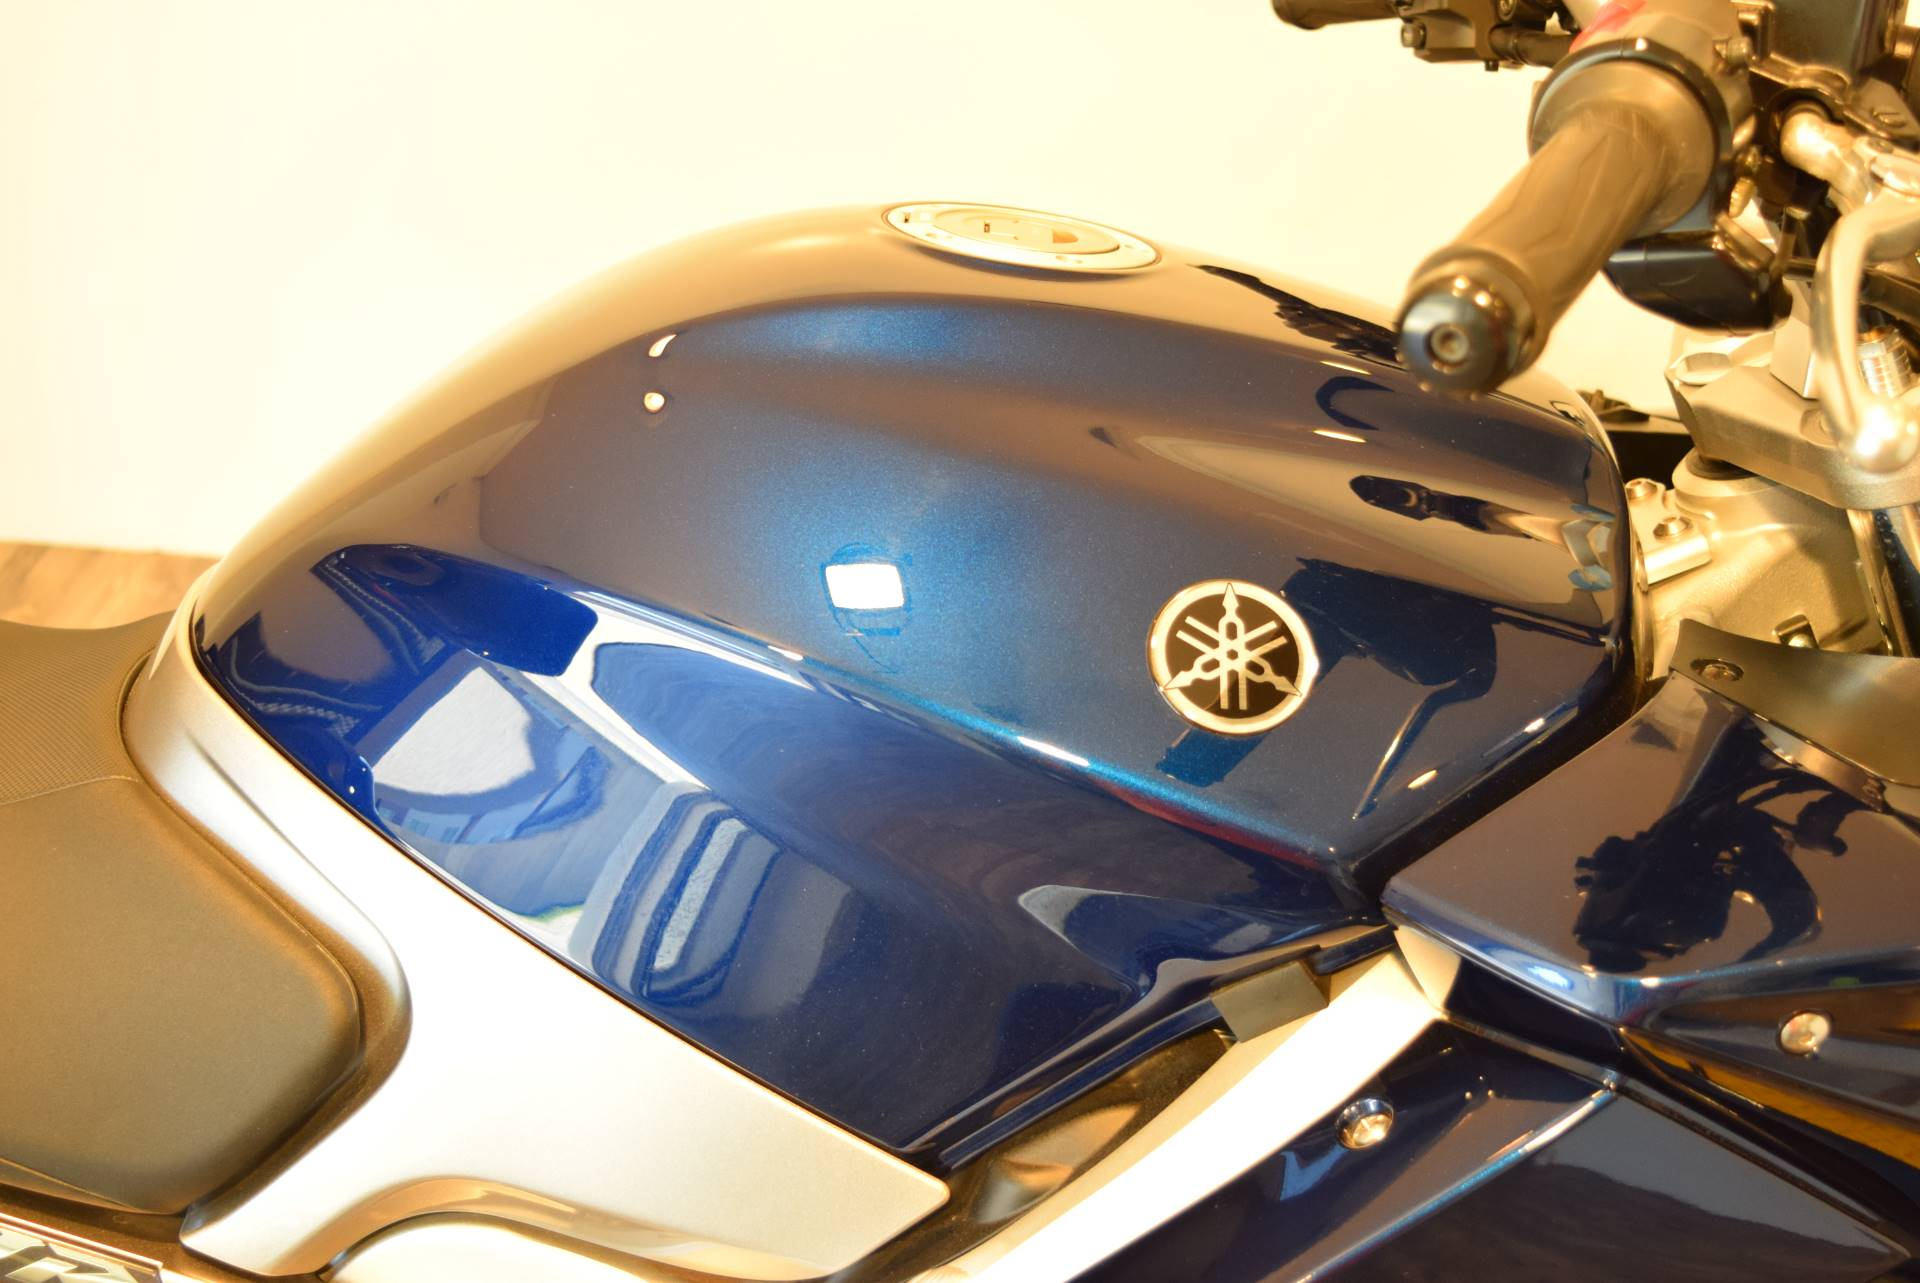 2012 Yamaha FJR1300A 4